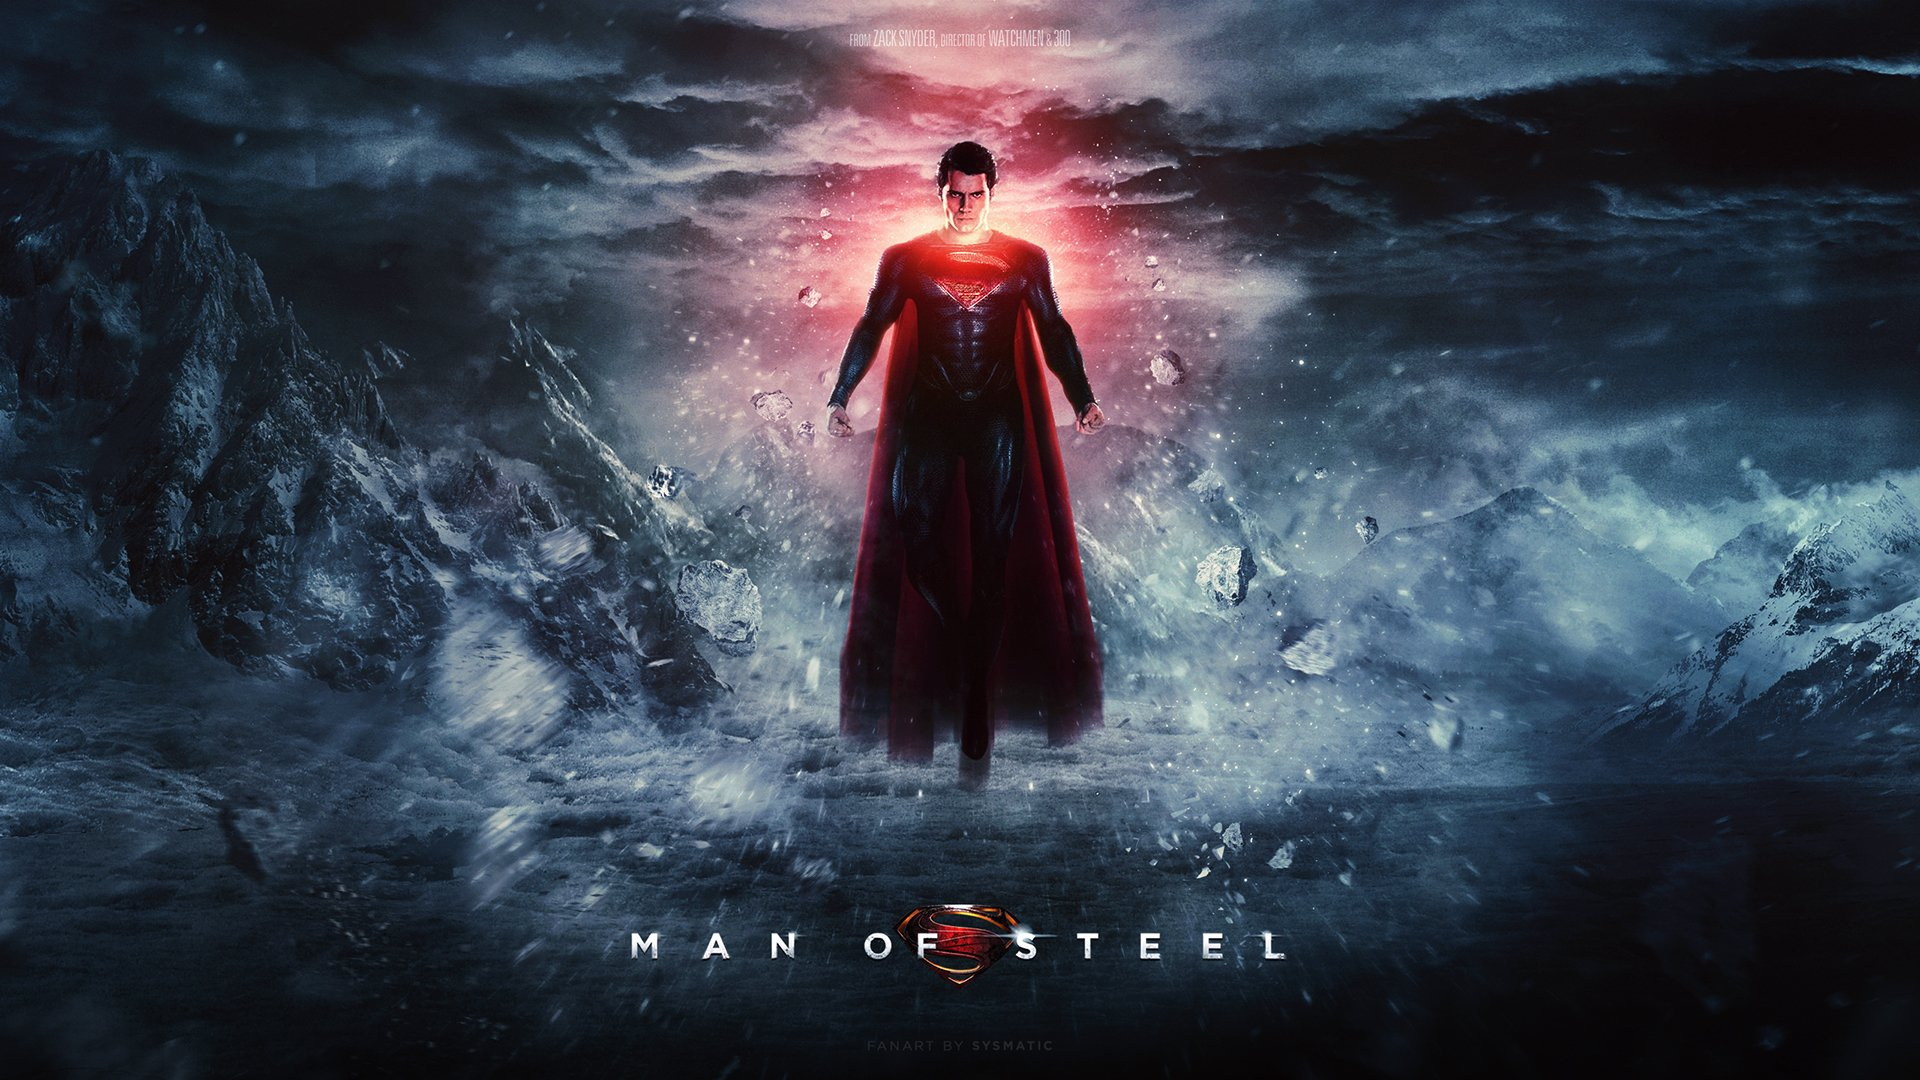 Free Download Man Of Steel Wallpaper Superman Movie 02 1920x1080 For Your Desktop Mobile Tablet Explore 71 Superman Man Of Steel Background Superman Man Of Steel Wallpaper Superman Man